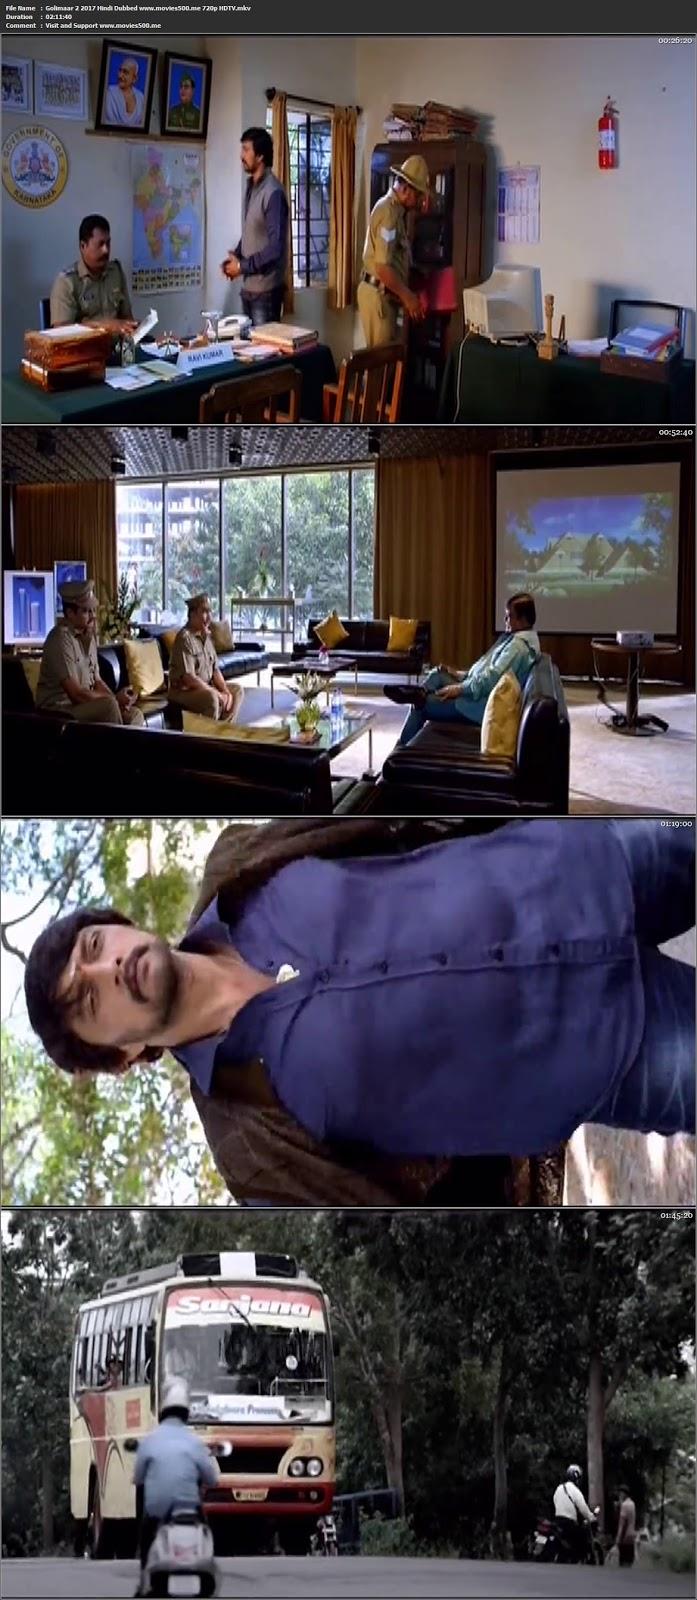 Golimaar 2 2017 Hindi Dubbed Download HDTV 720p at gencoalumni.info